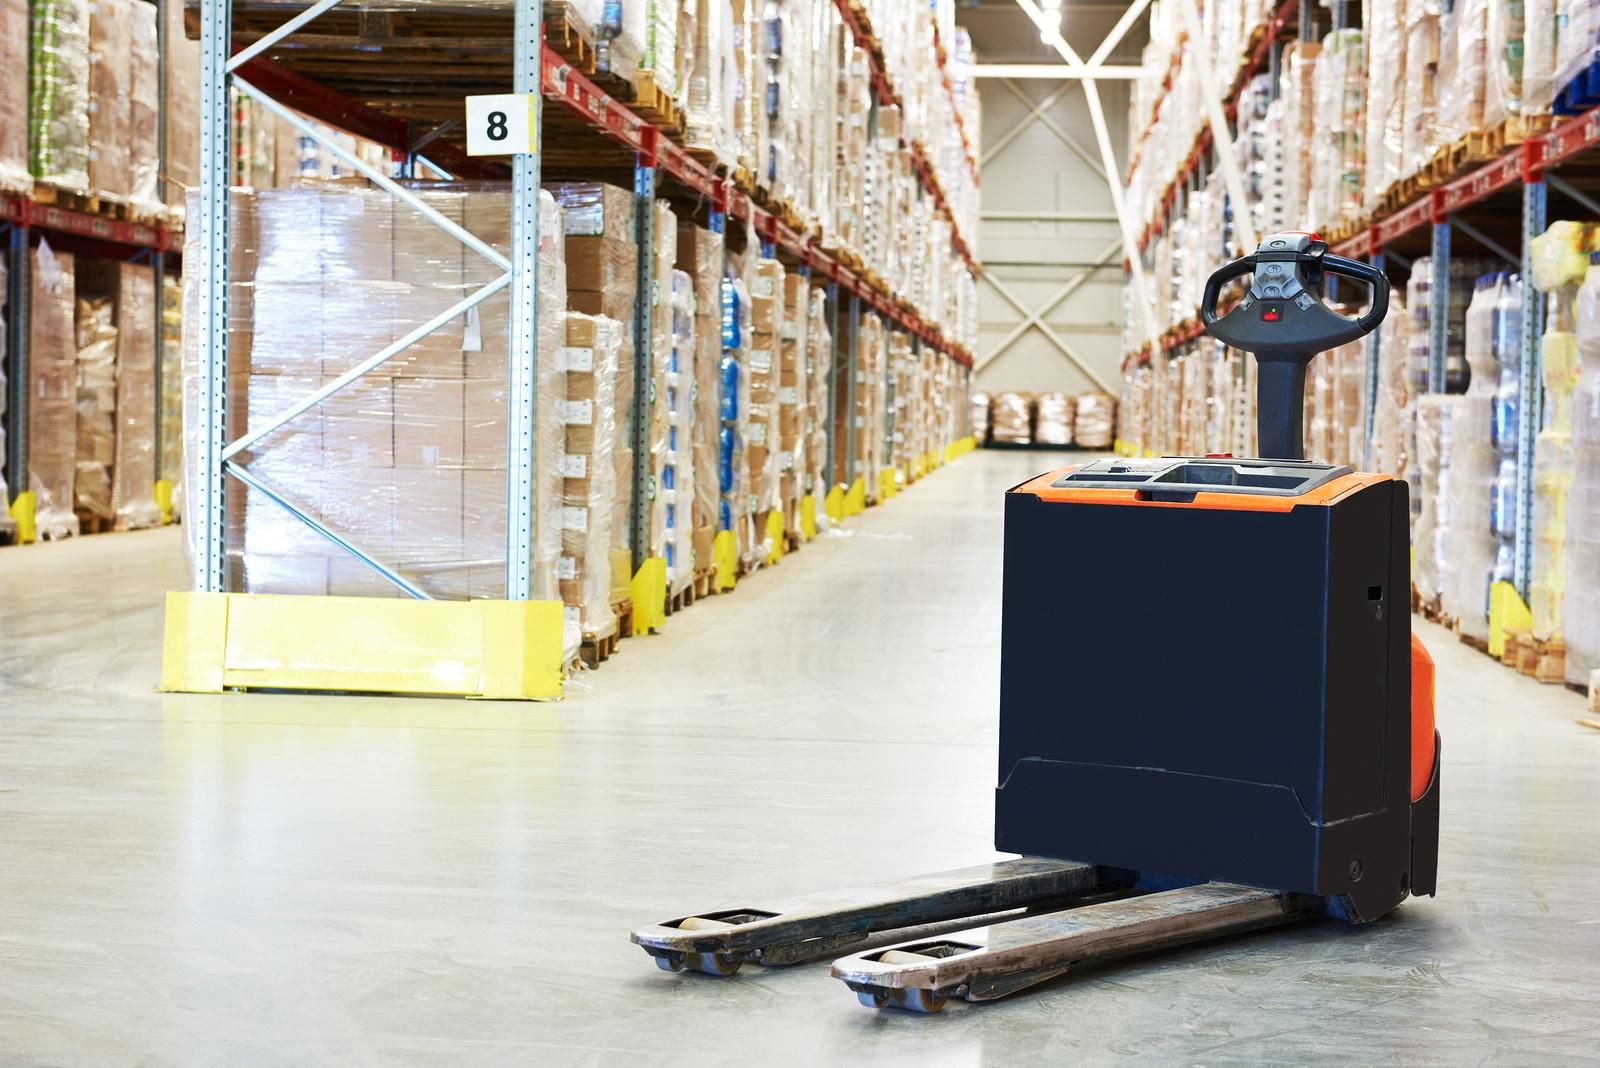 pallet truck in warehouse